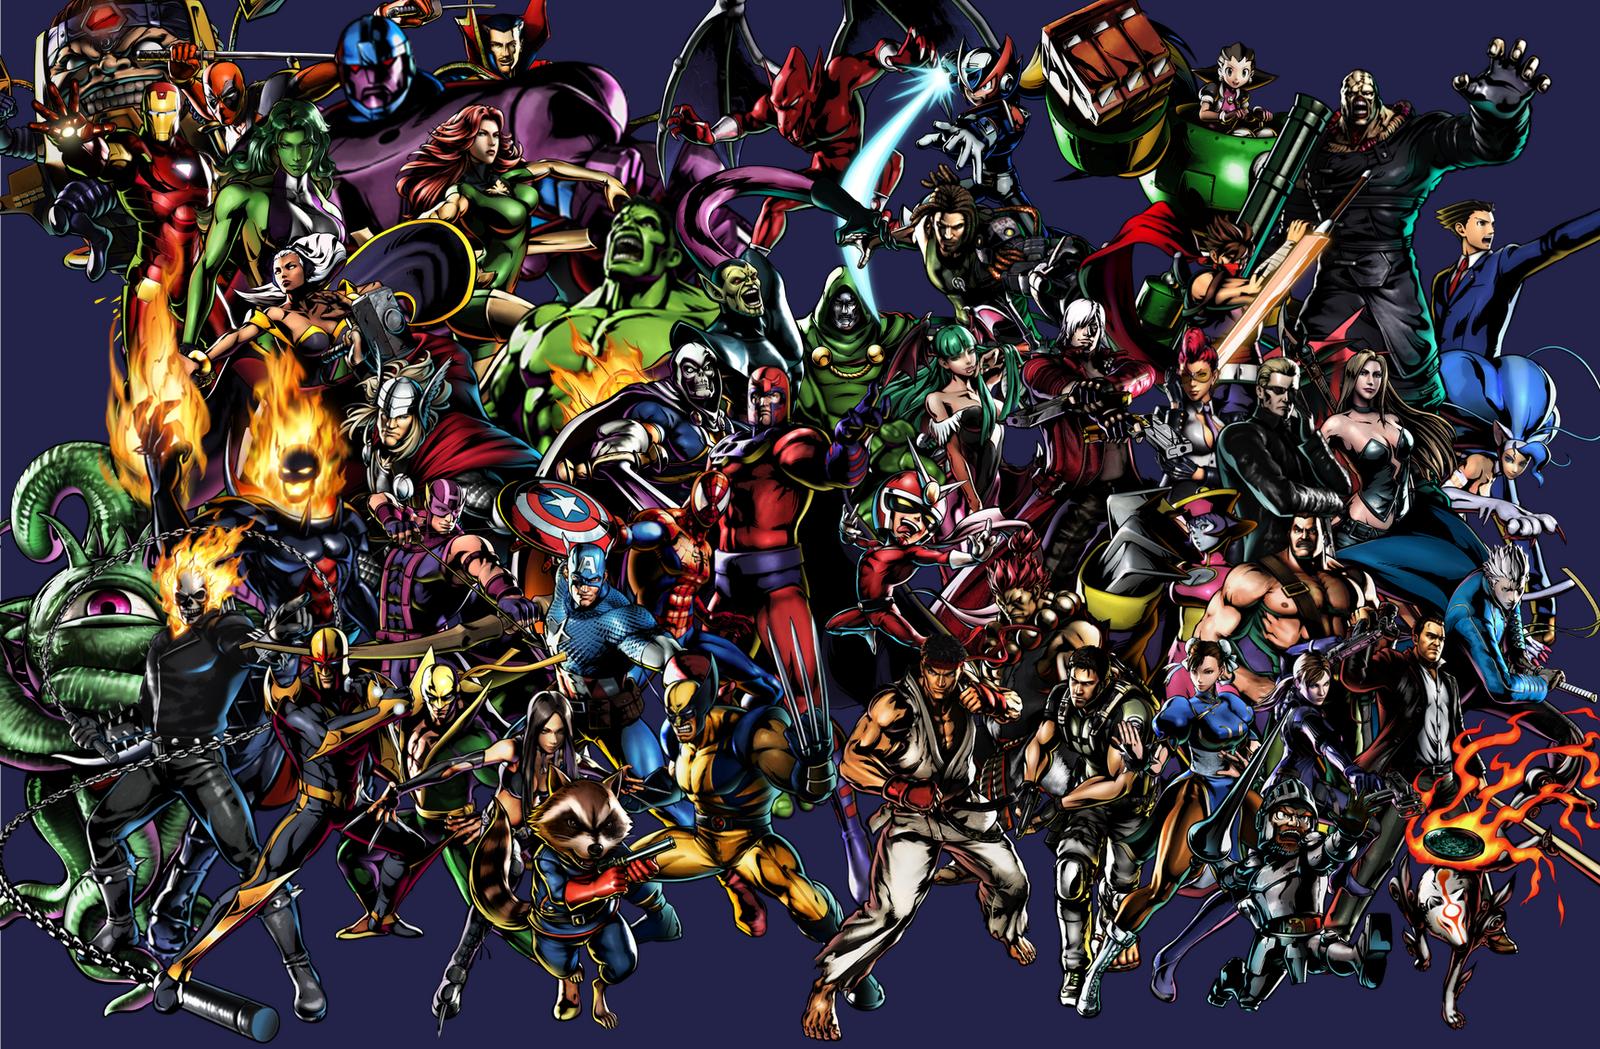 All About Football Wallpaper Ultimate Marvel Vs Capcom 3